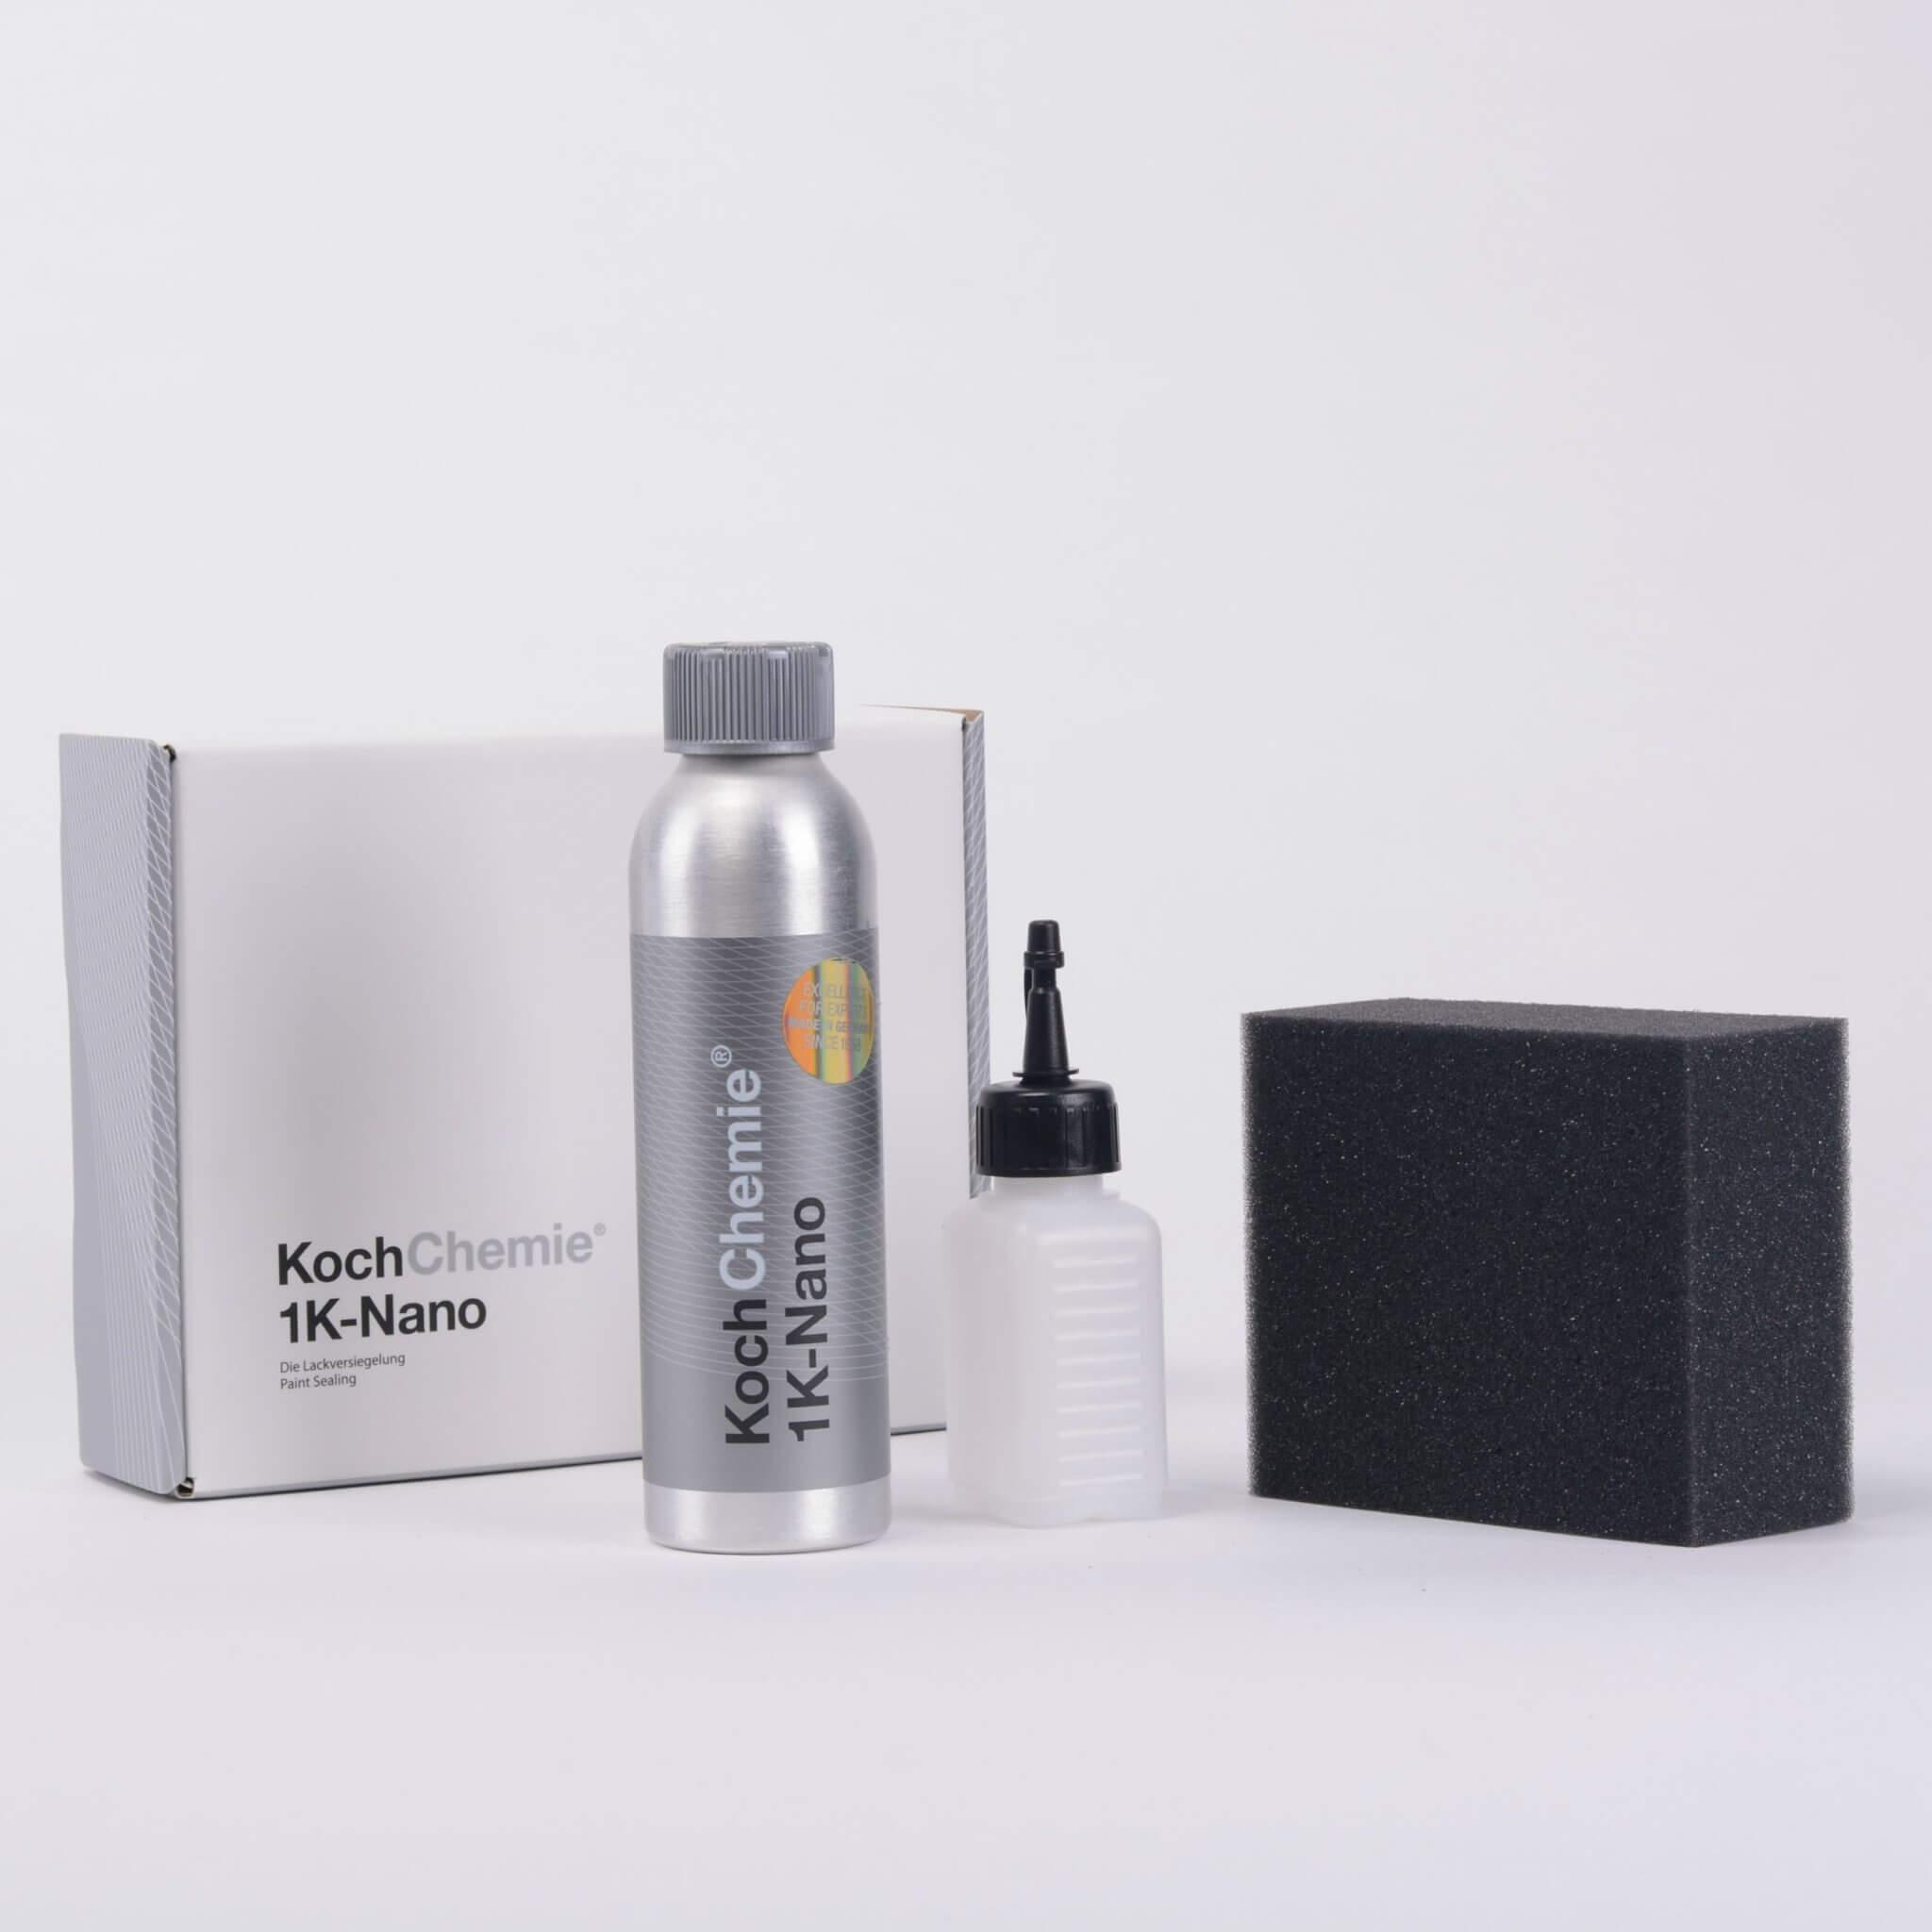 protectie nano ceramica 250ml 1k nano koch chemie carhub. Black Bedroom Furniture Sets. Home Design Ideas